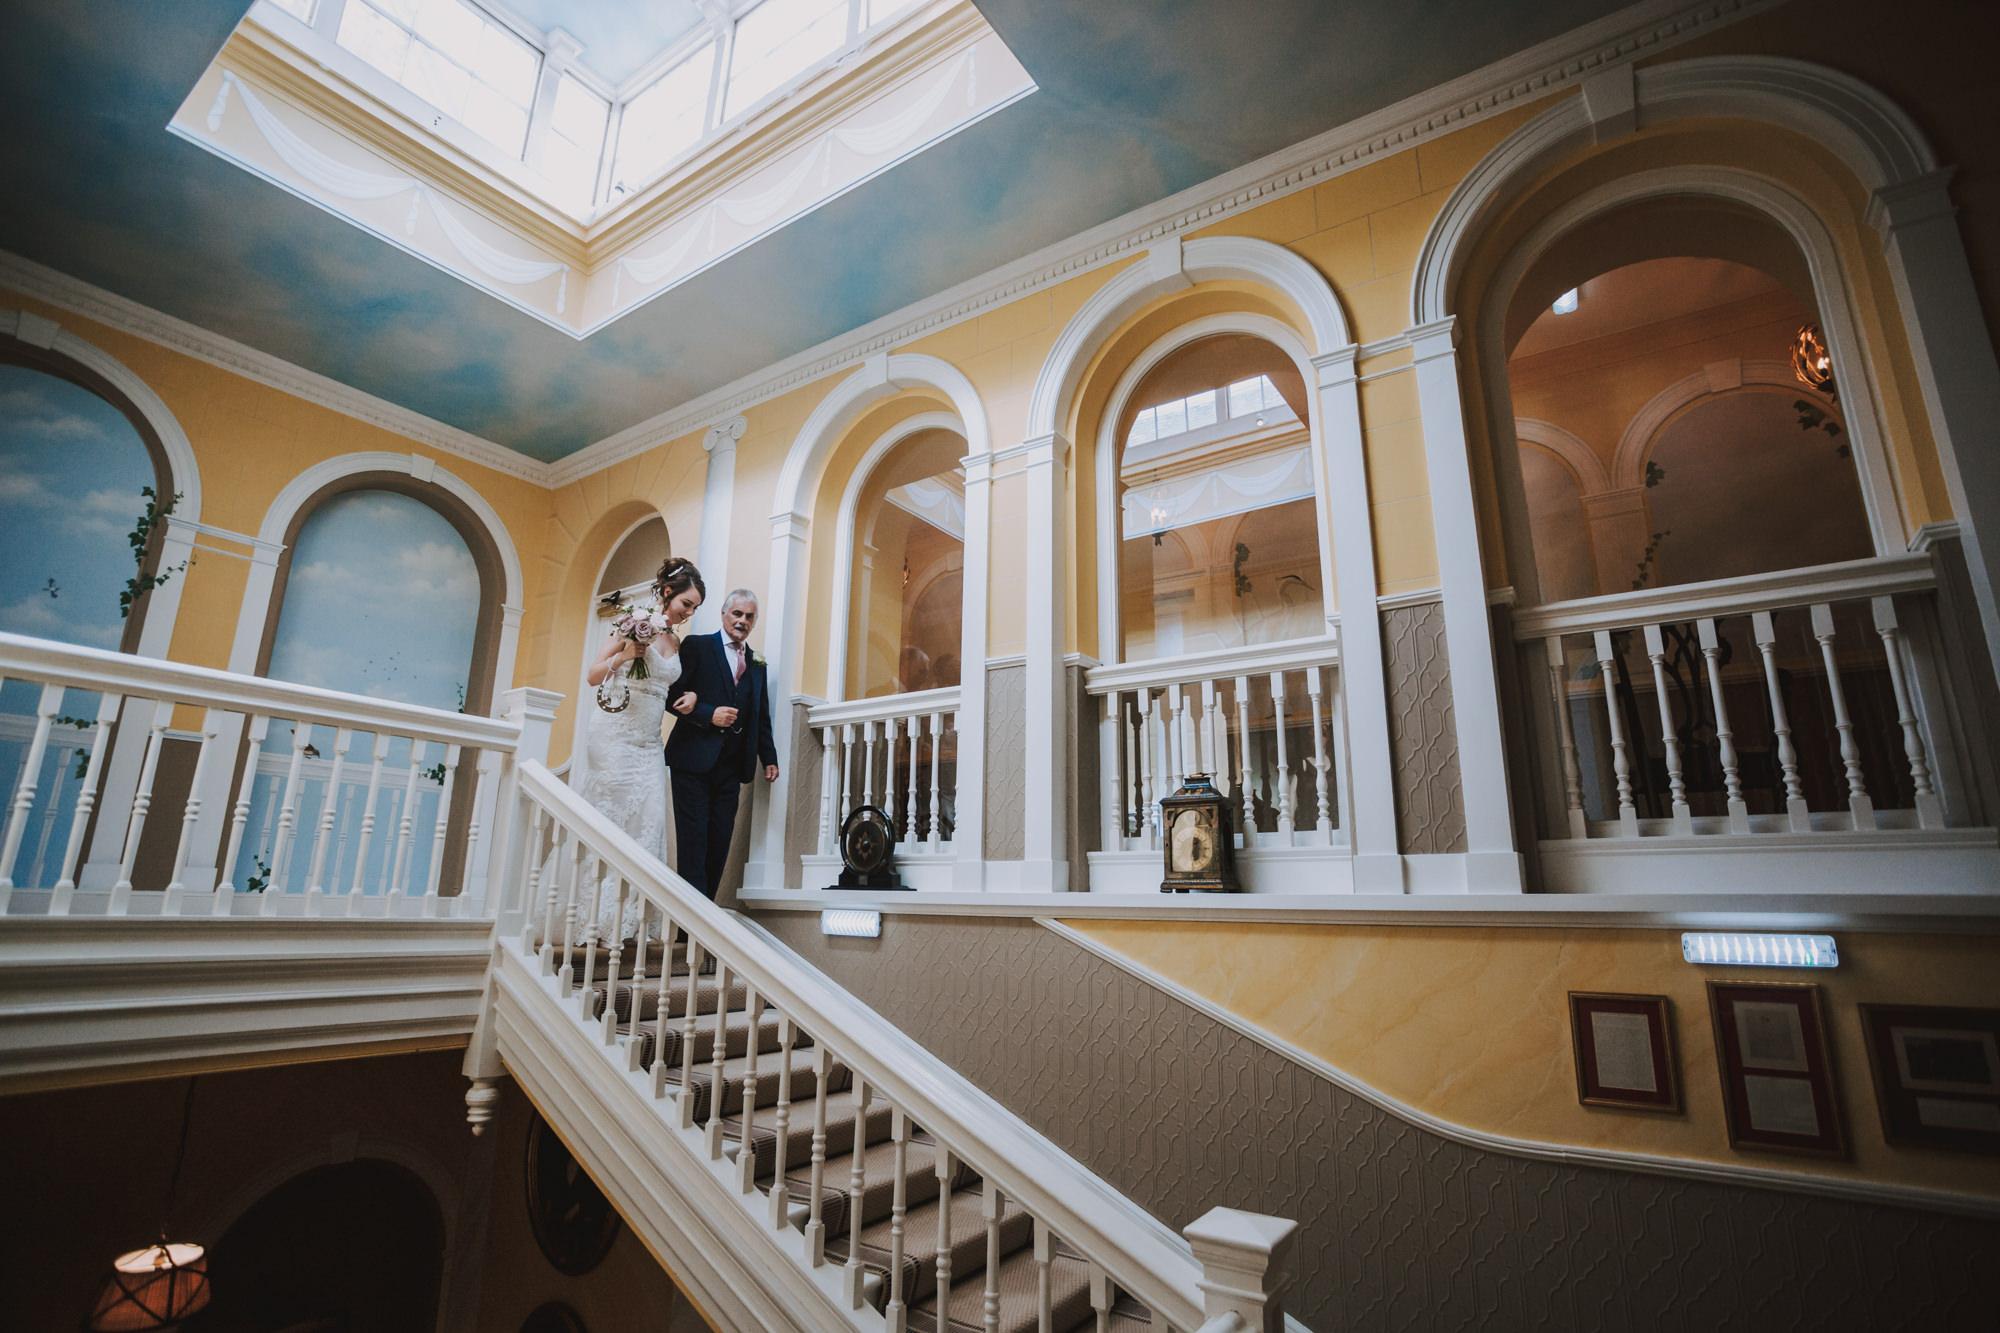 hodsock priory wedding photographers blog36.jpg